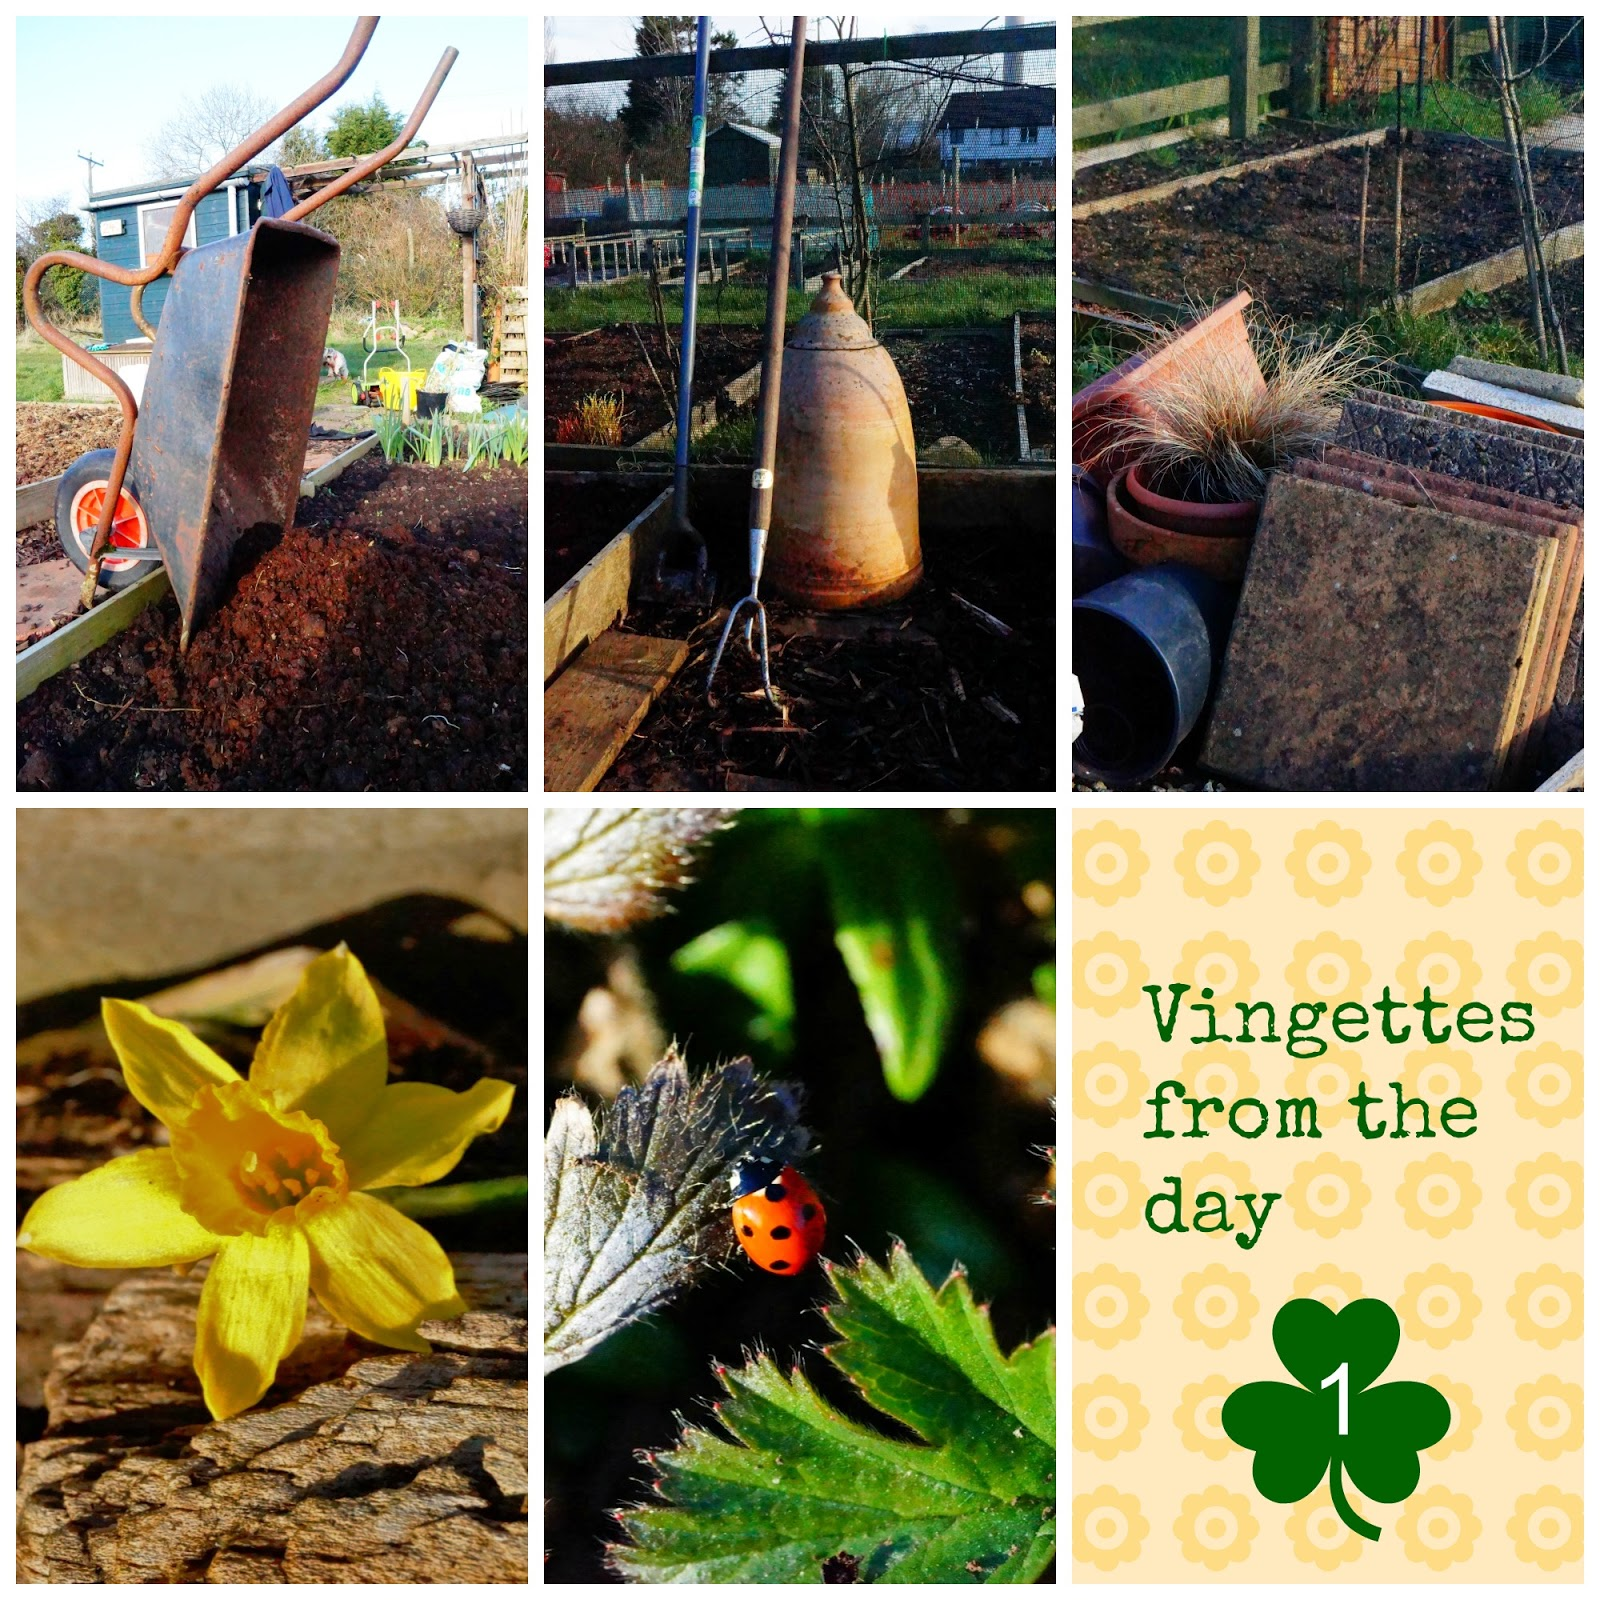 Vingettes from Day 1 - growourown.blogspot.com ~ alloment blog